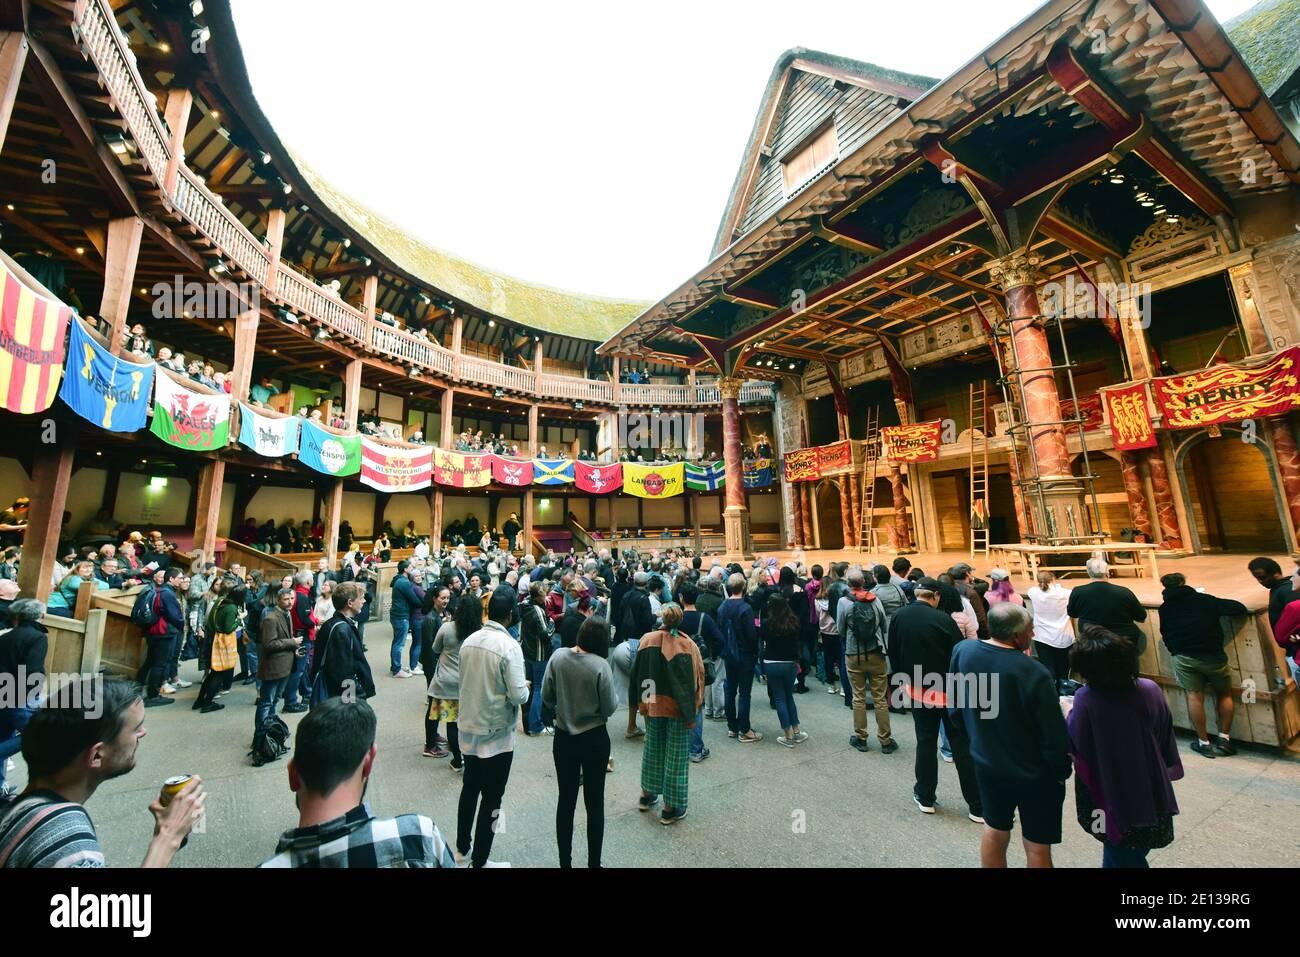 Londres, Reino Unido. 07th Sep, 2019. La entrada al teatro Shakespeare's Globe. Las actuaciones tienen lugar al aire libre. Crédito: Waltraud Grubitzsch/dpa-Zentralbild/ZB/dpa/Alamy Live News Foto de stock